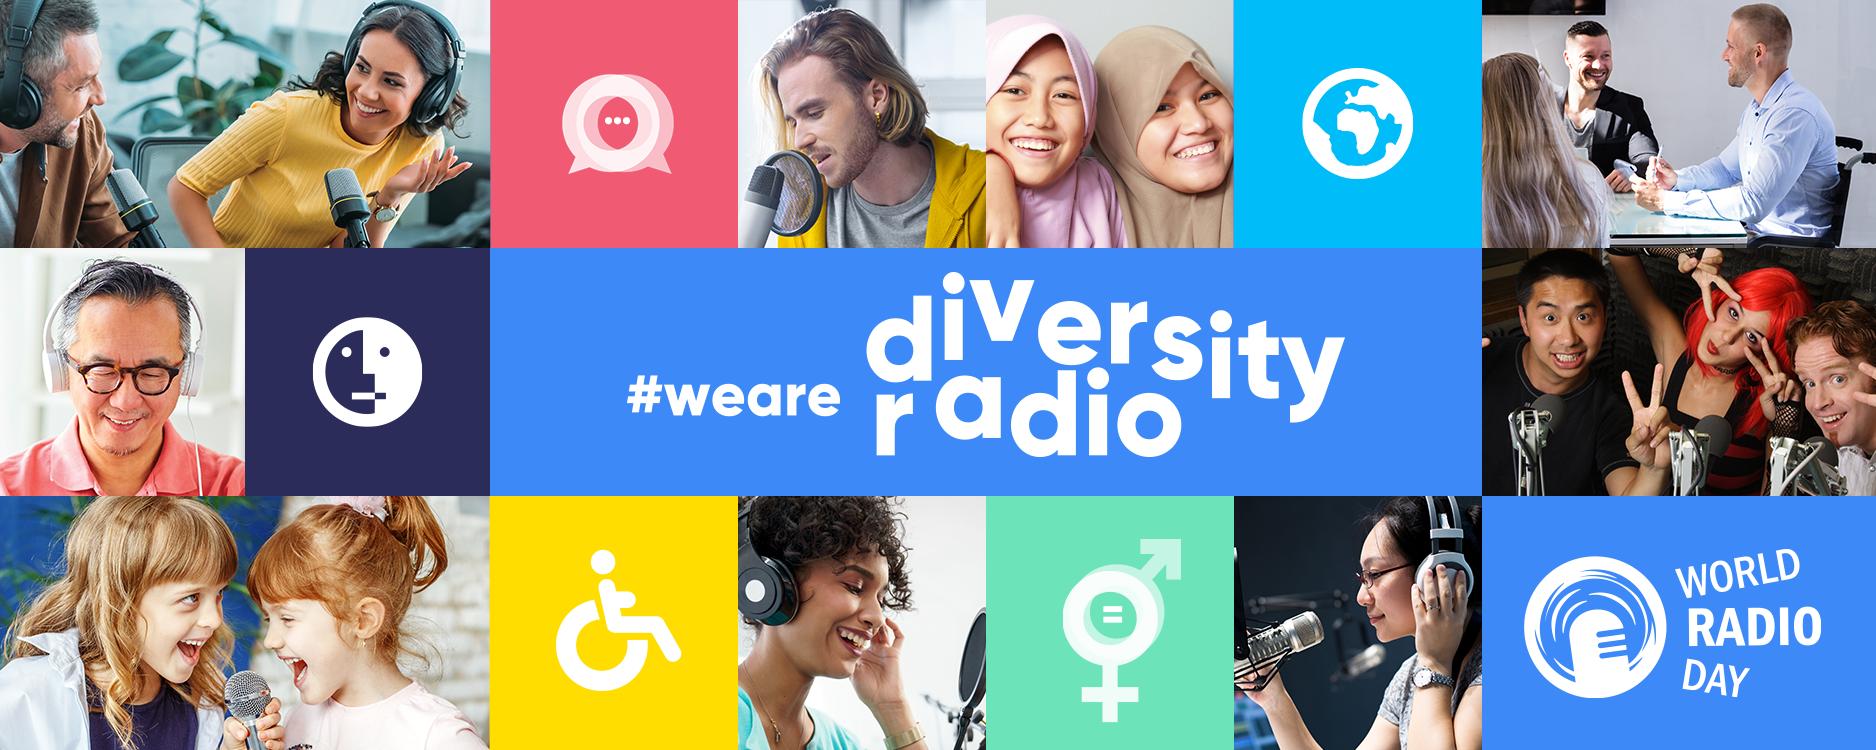 worldradioday banner2